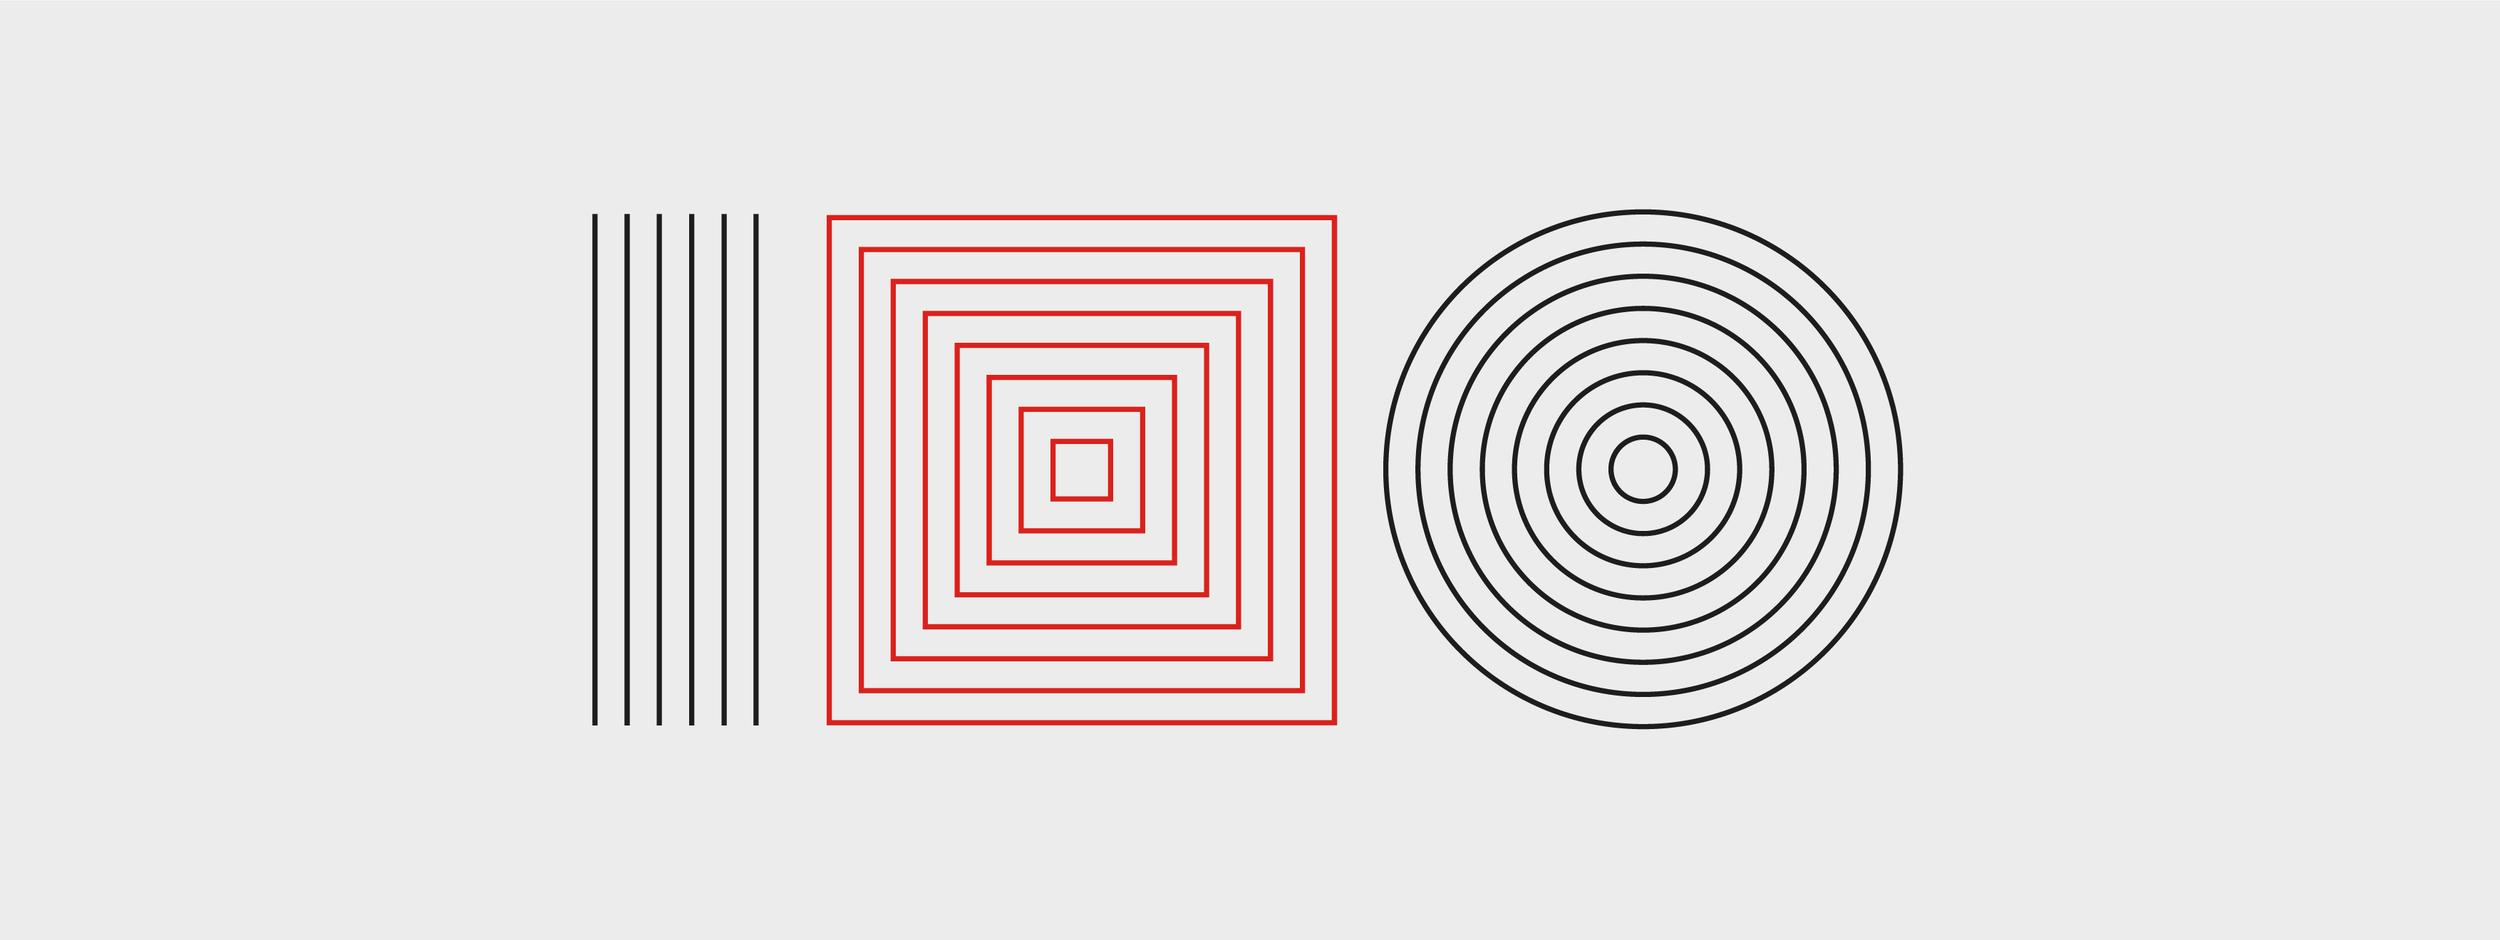 Logo represents 26 members of University of Ljubljana. Lines (22) + shapes (3) + the whole logo (1) = 26.